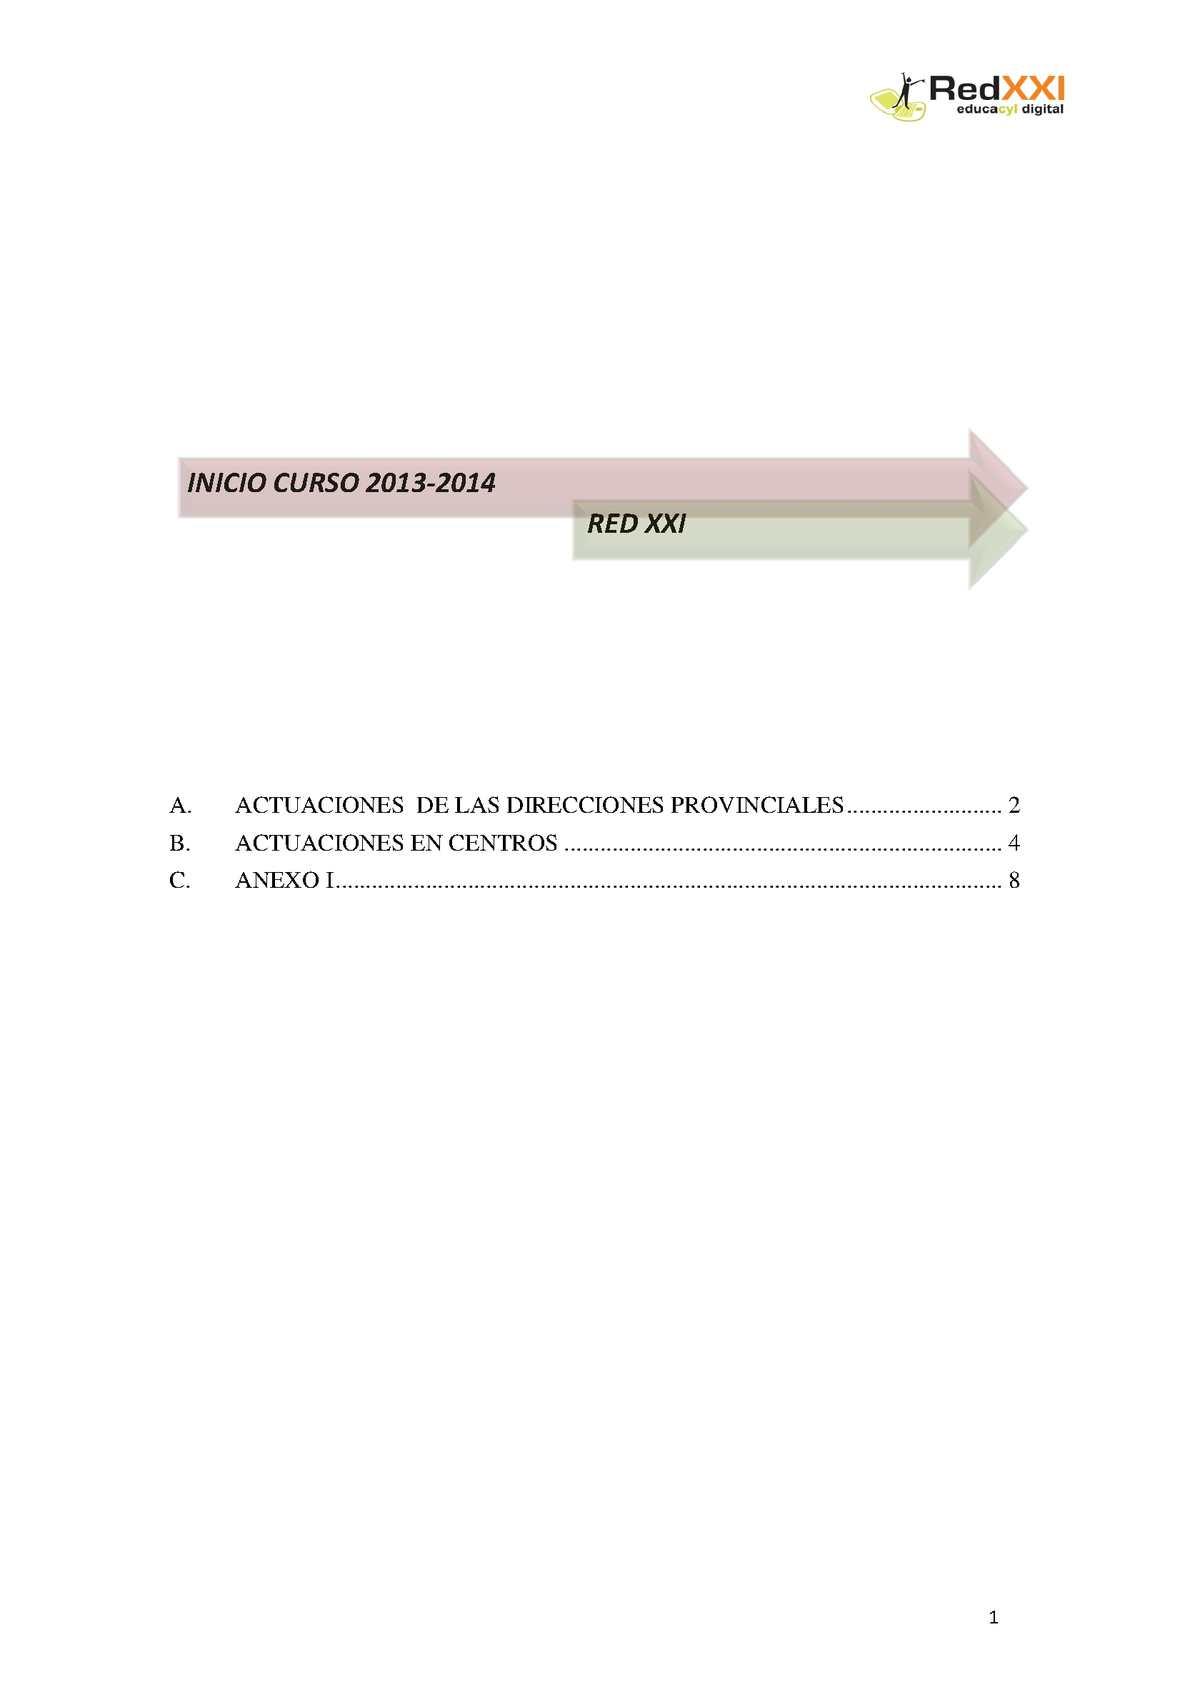 Calendario Educacyl.Calameo Red Xxi